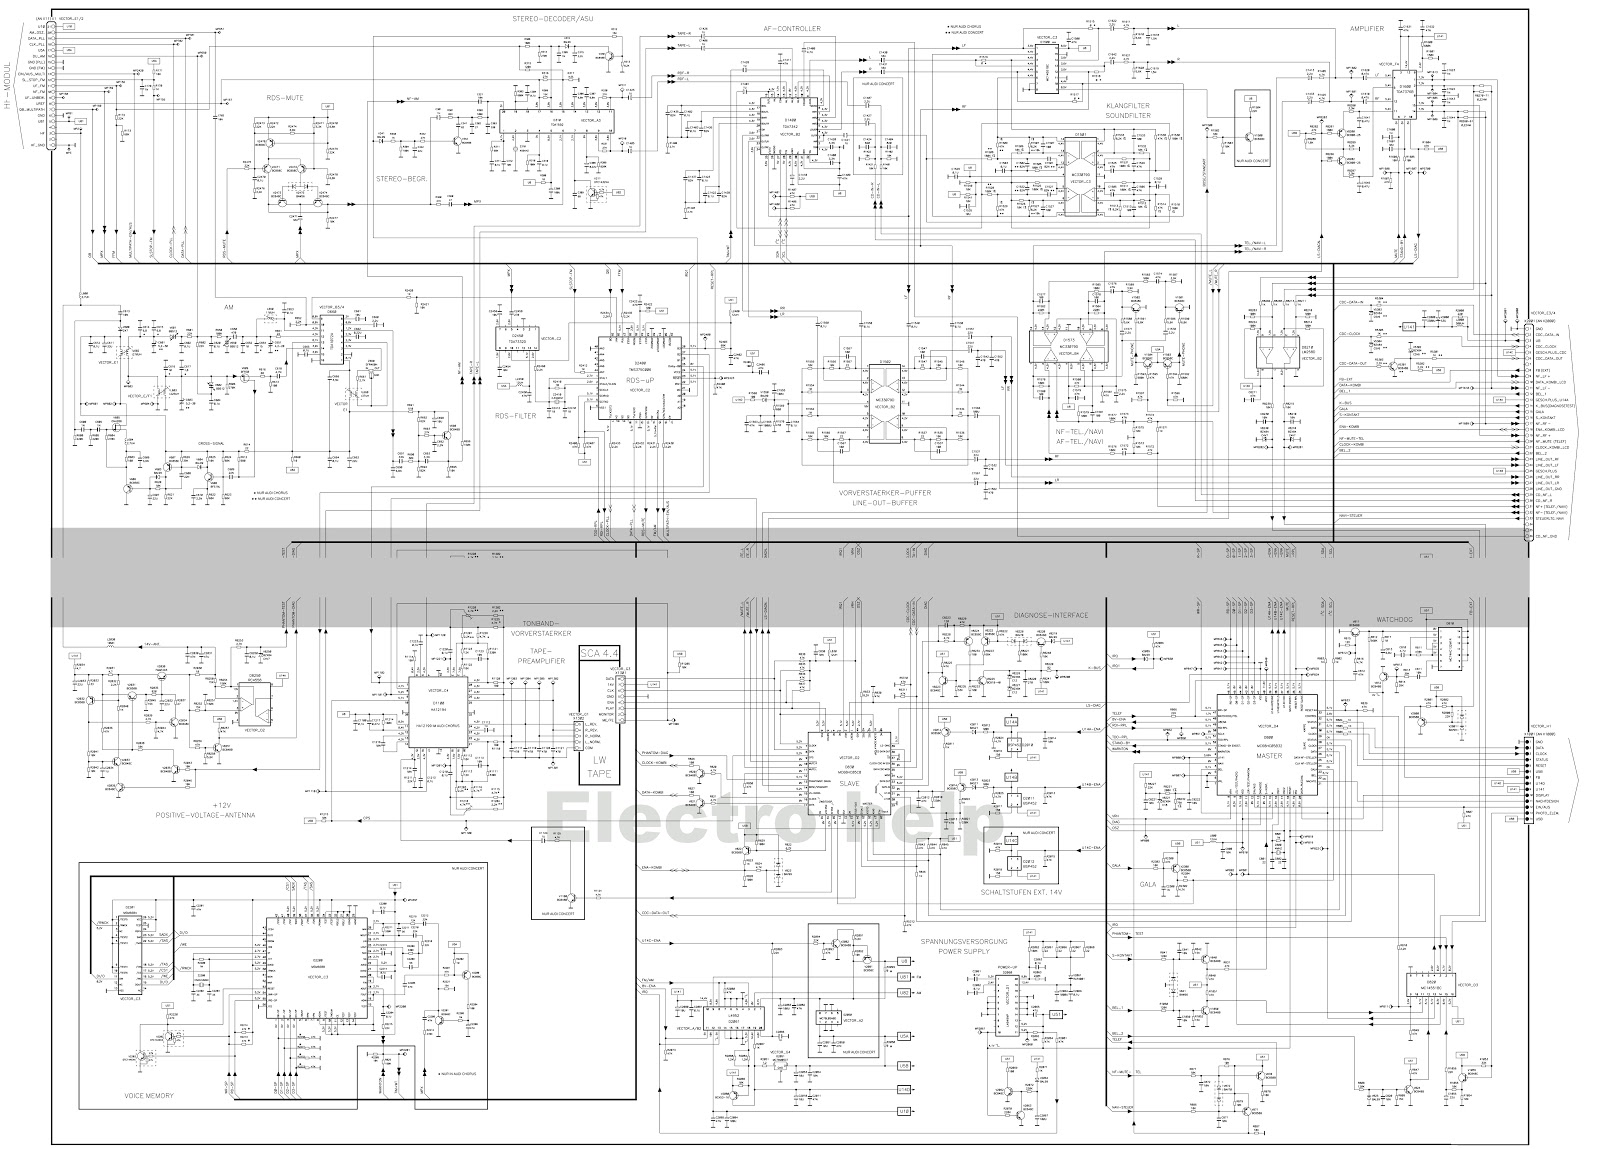 skoda superb fuse box layout